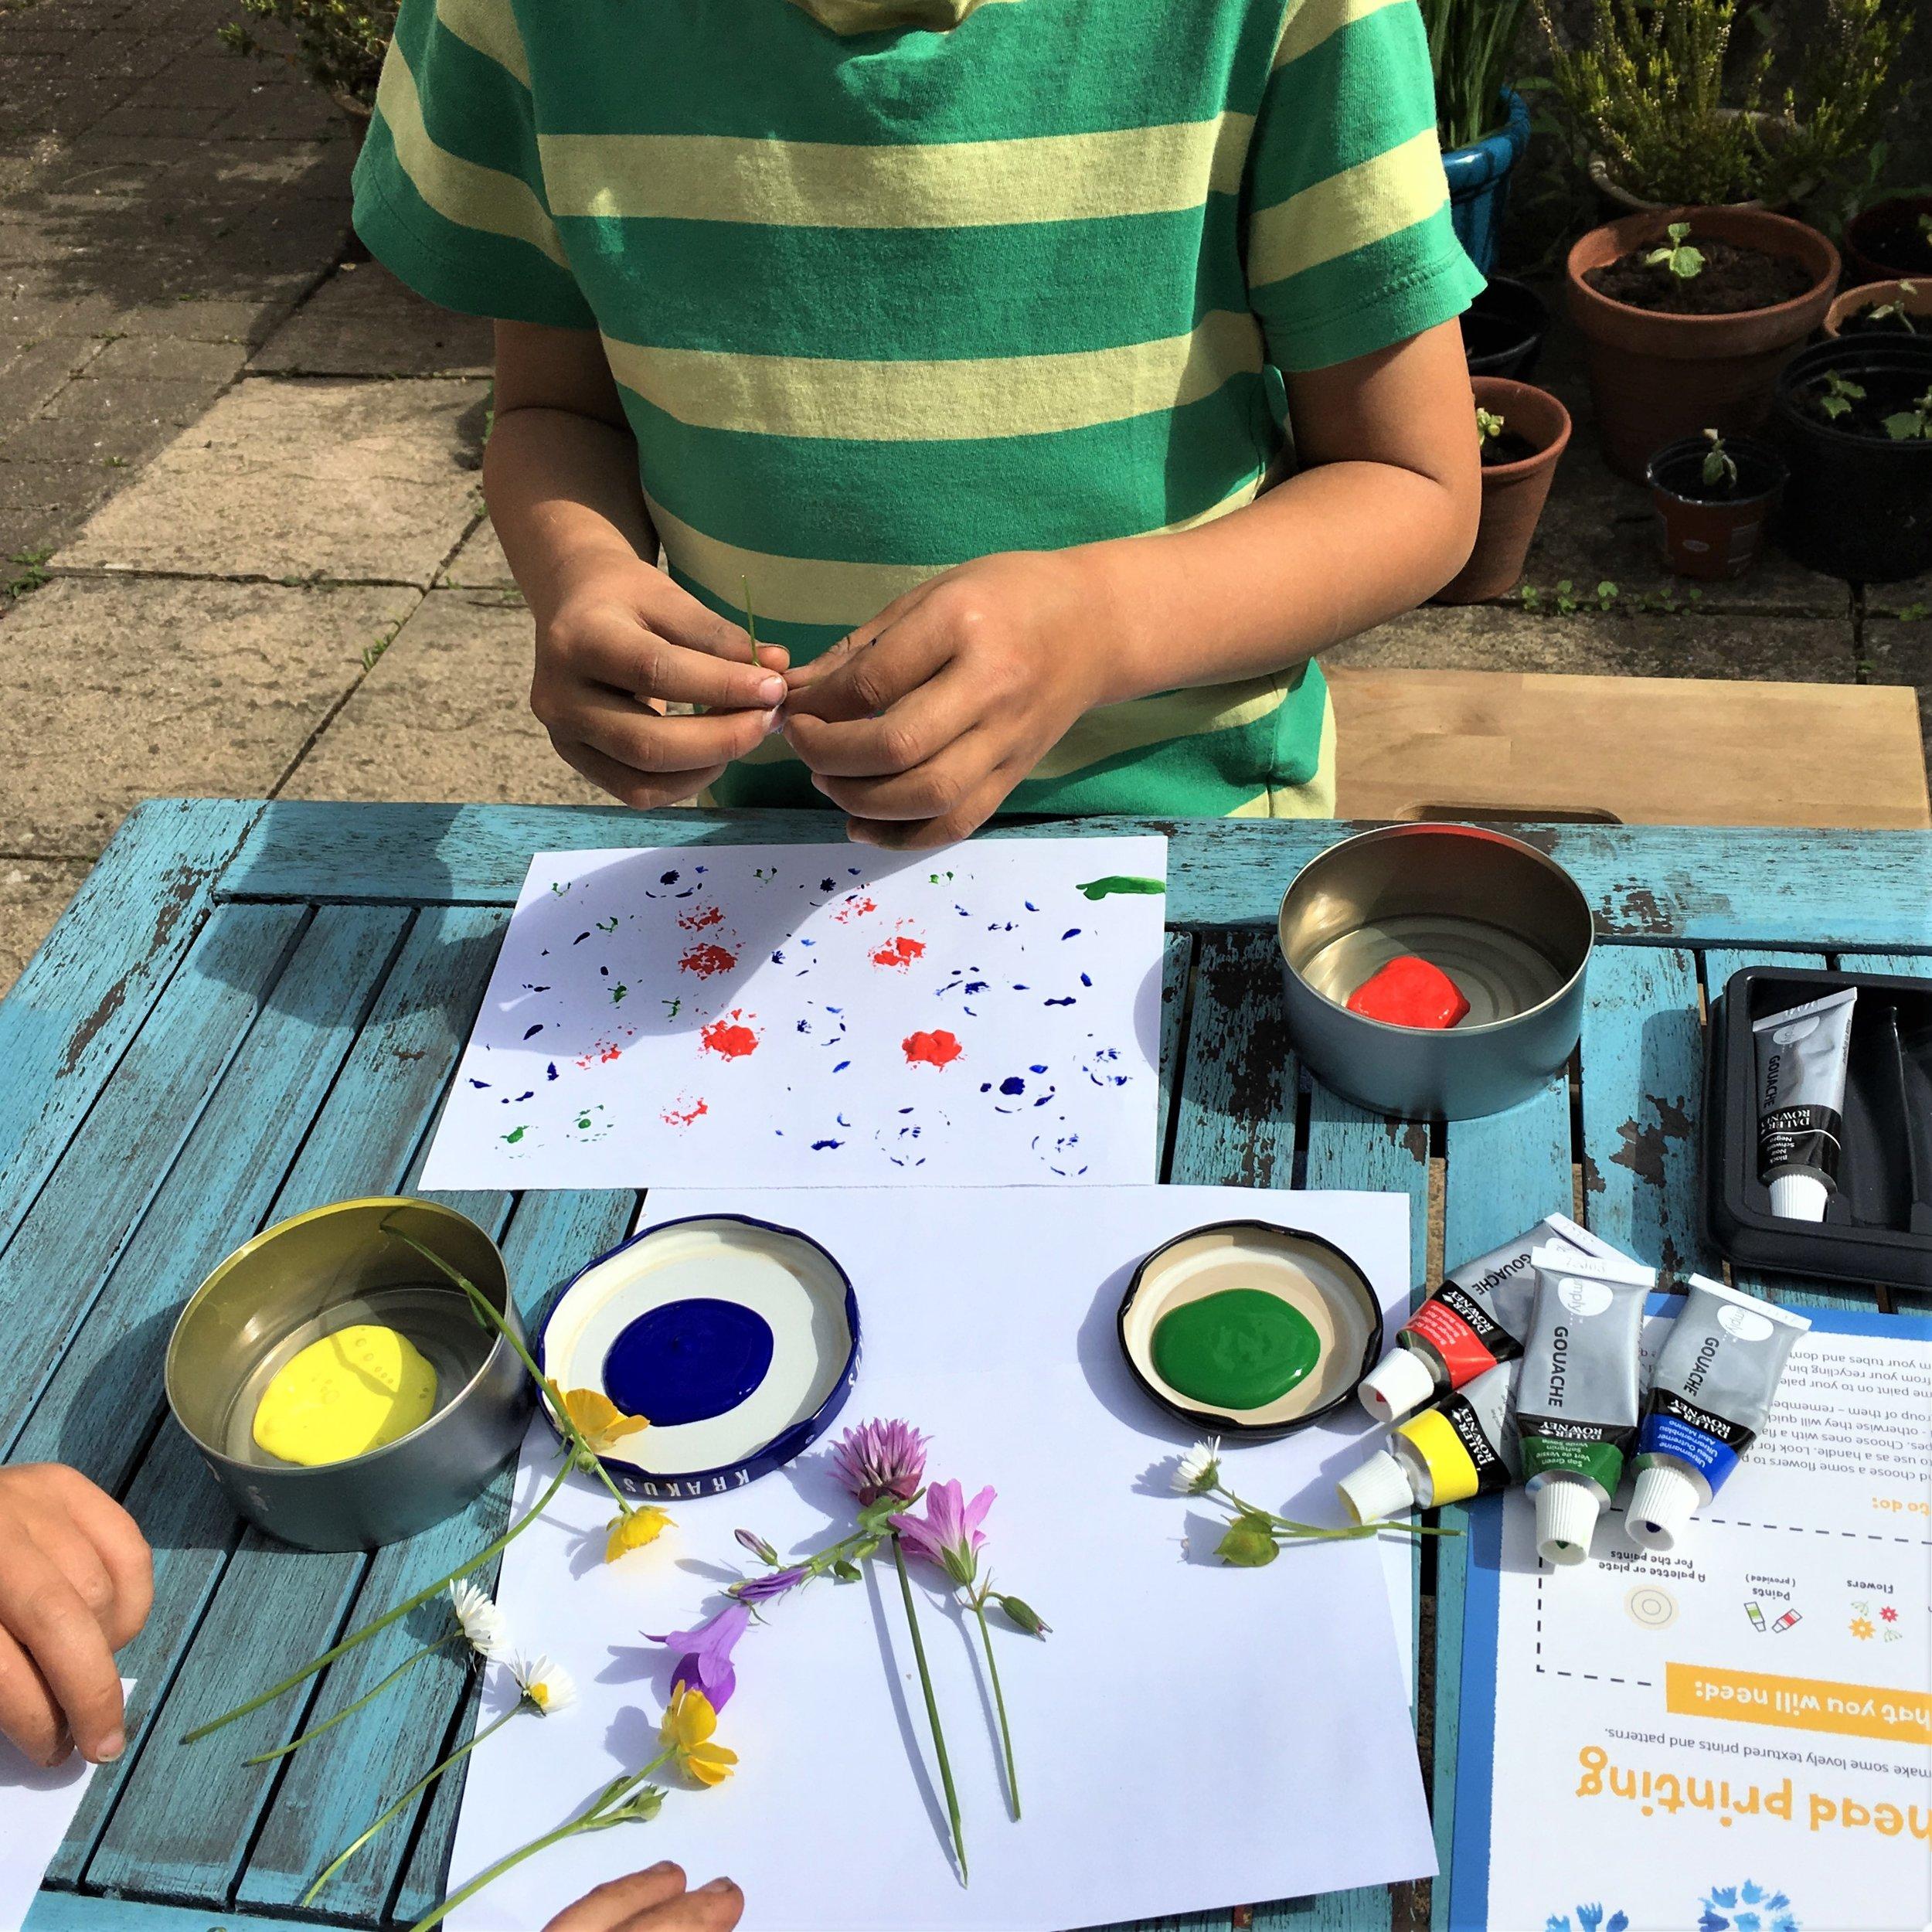 Plastic free eco children's crafts